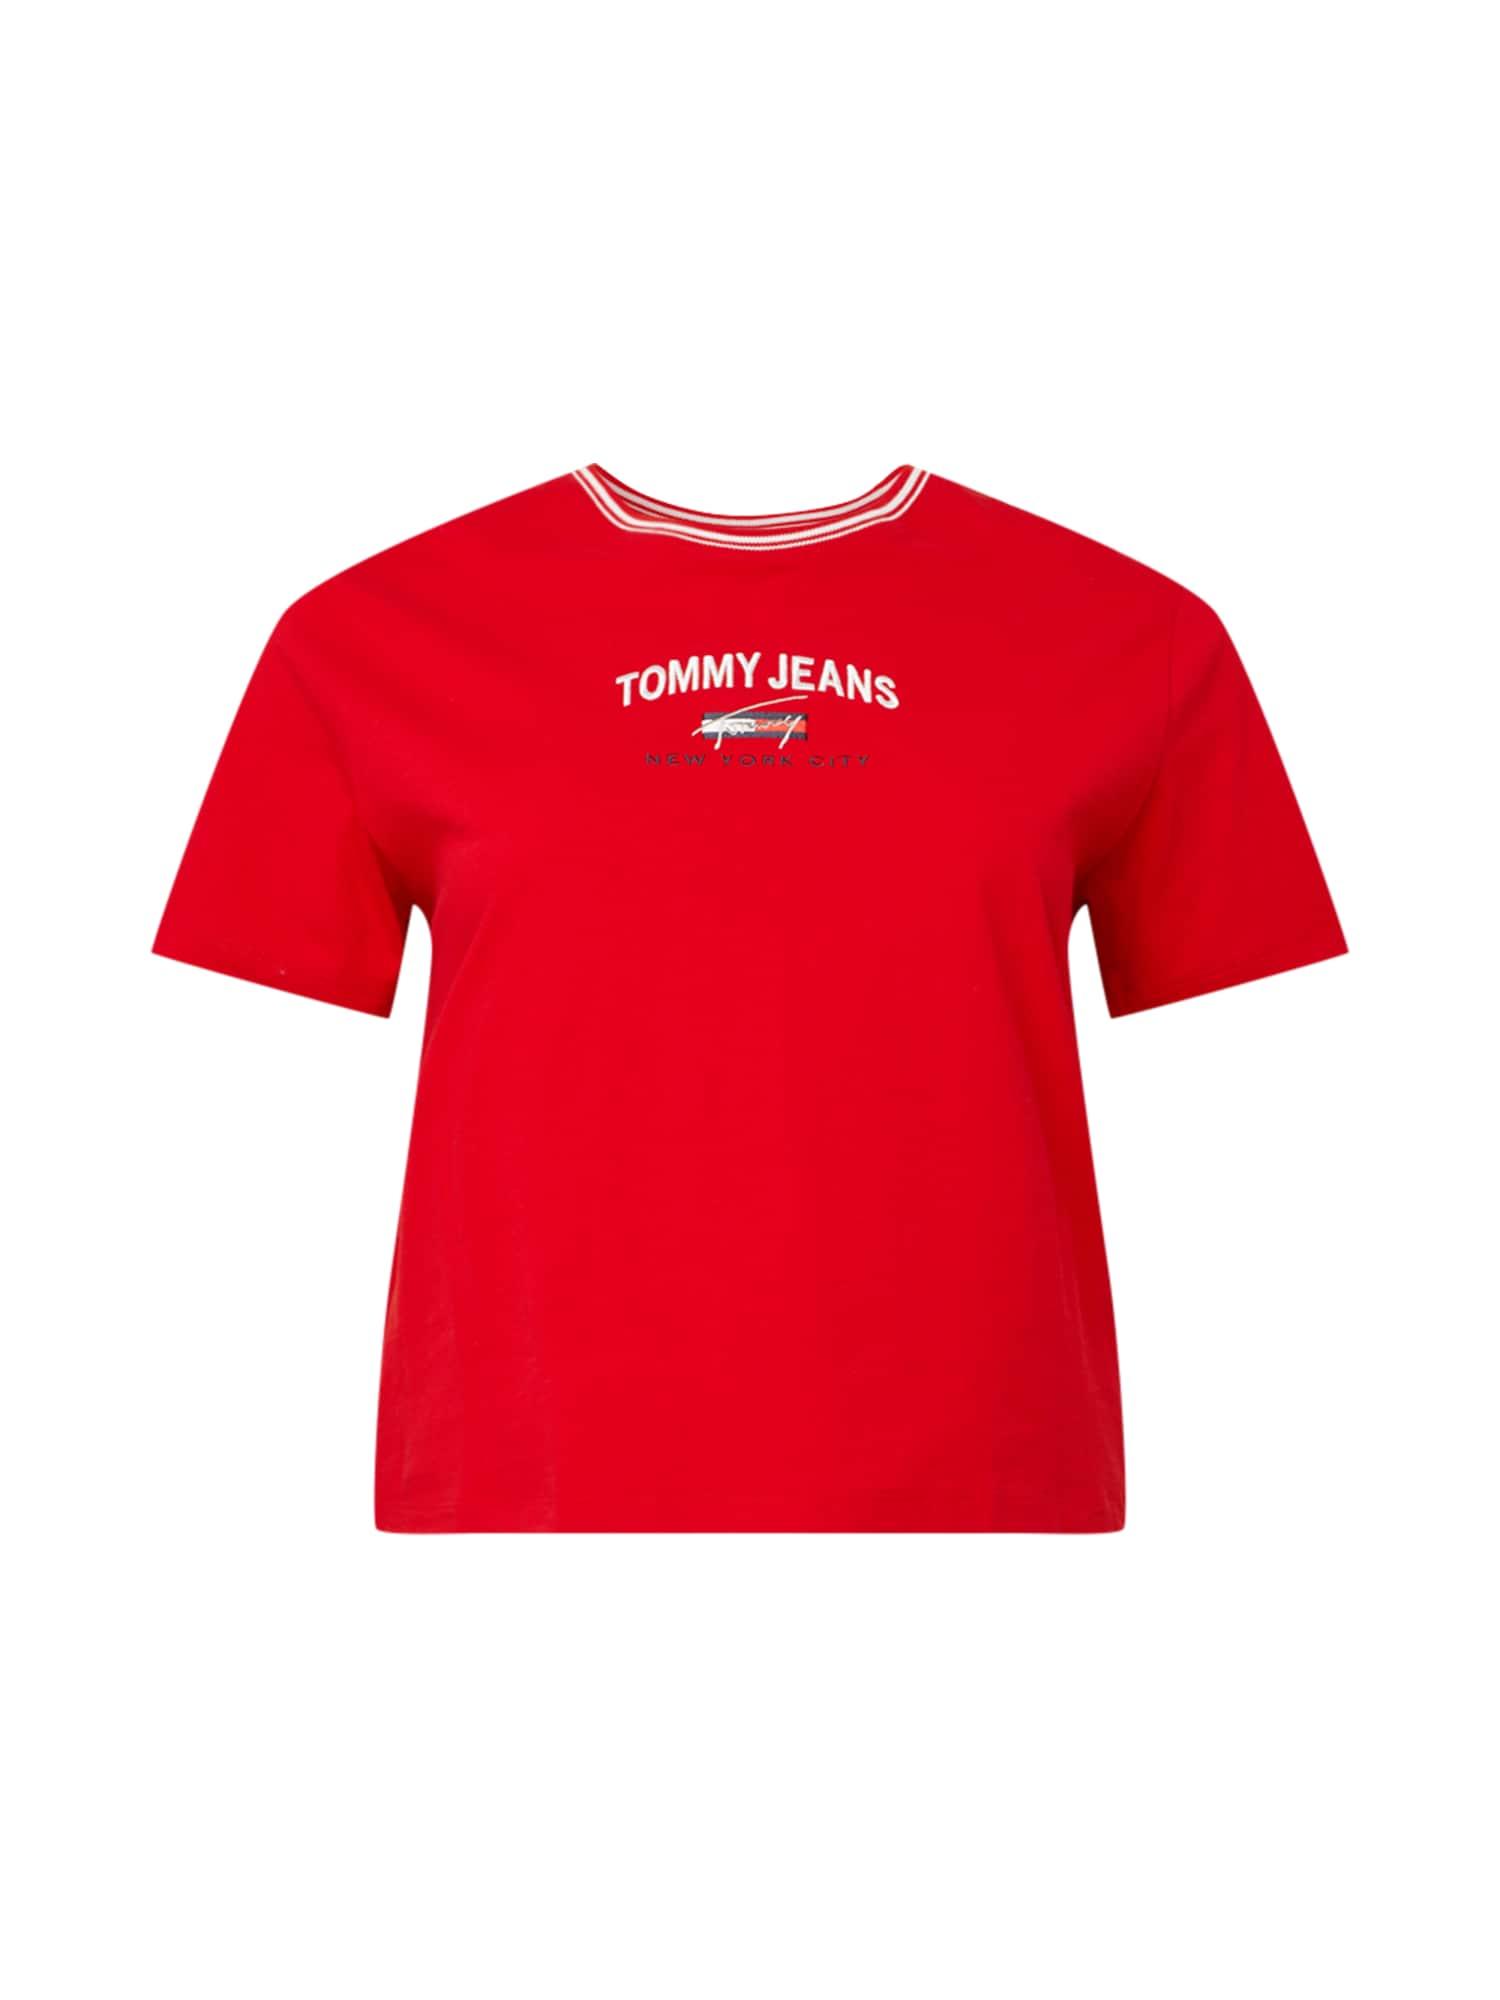 Tommy Jeans Curve Marškinėliai raudona / balta / tamsiai mėlyna